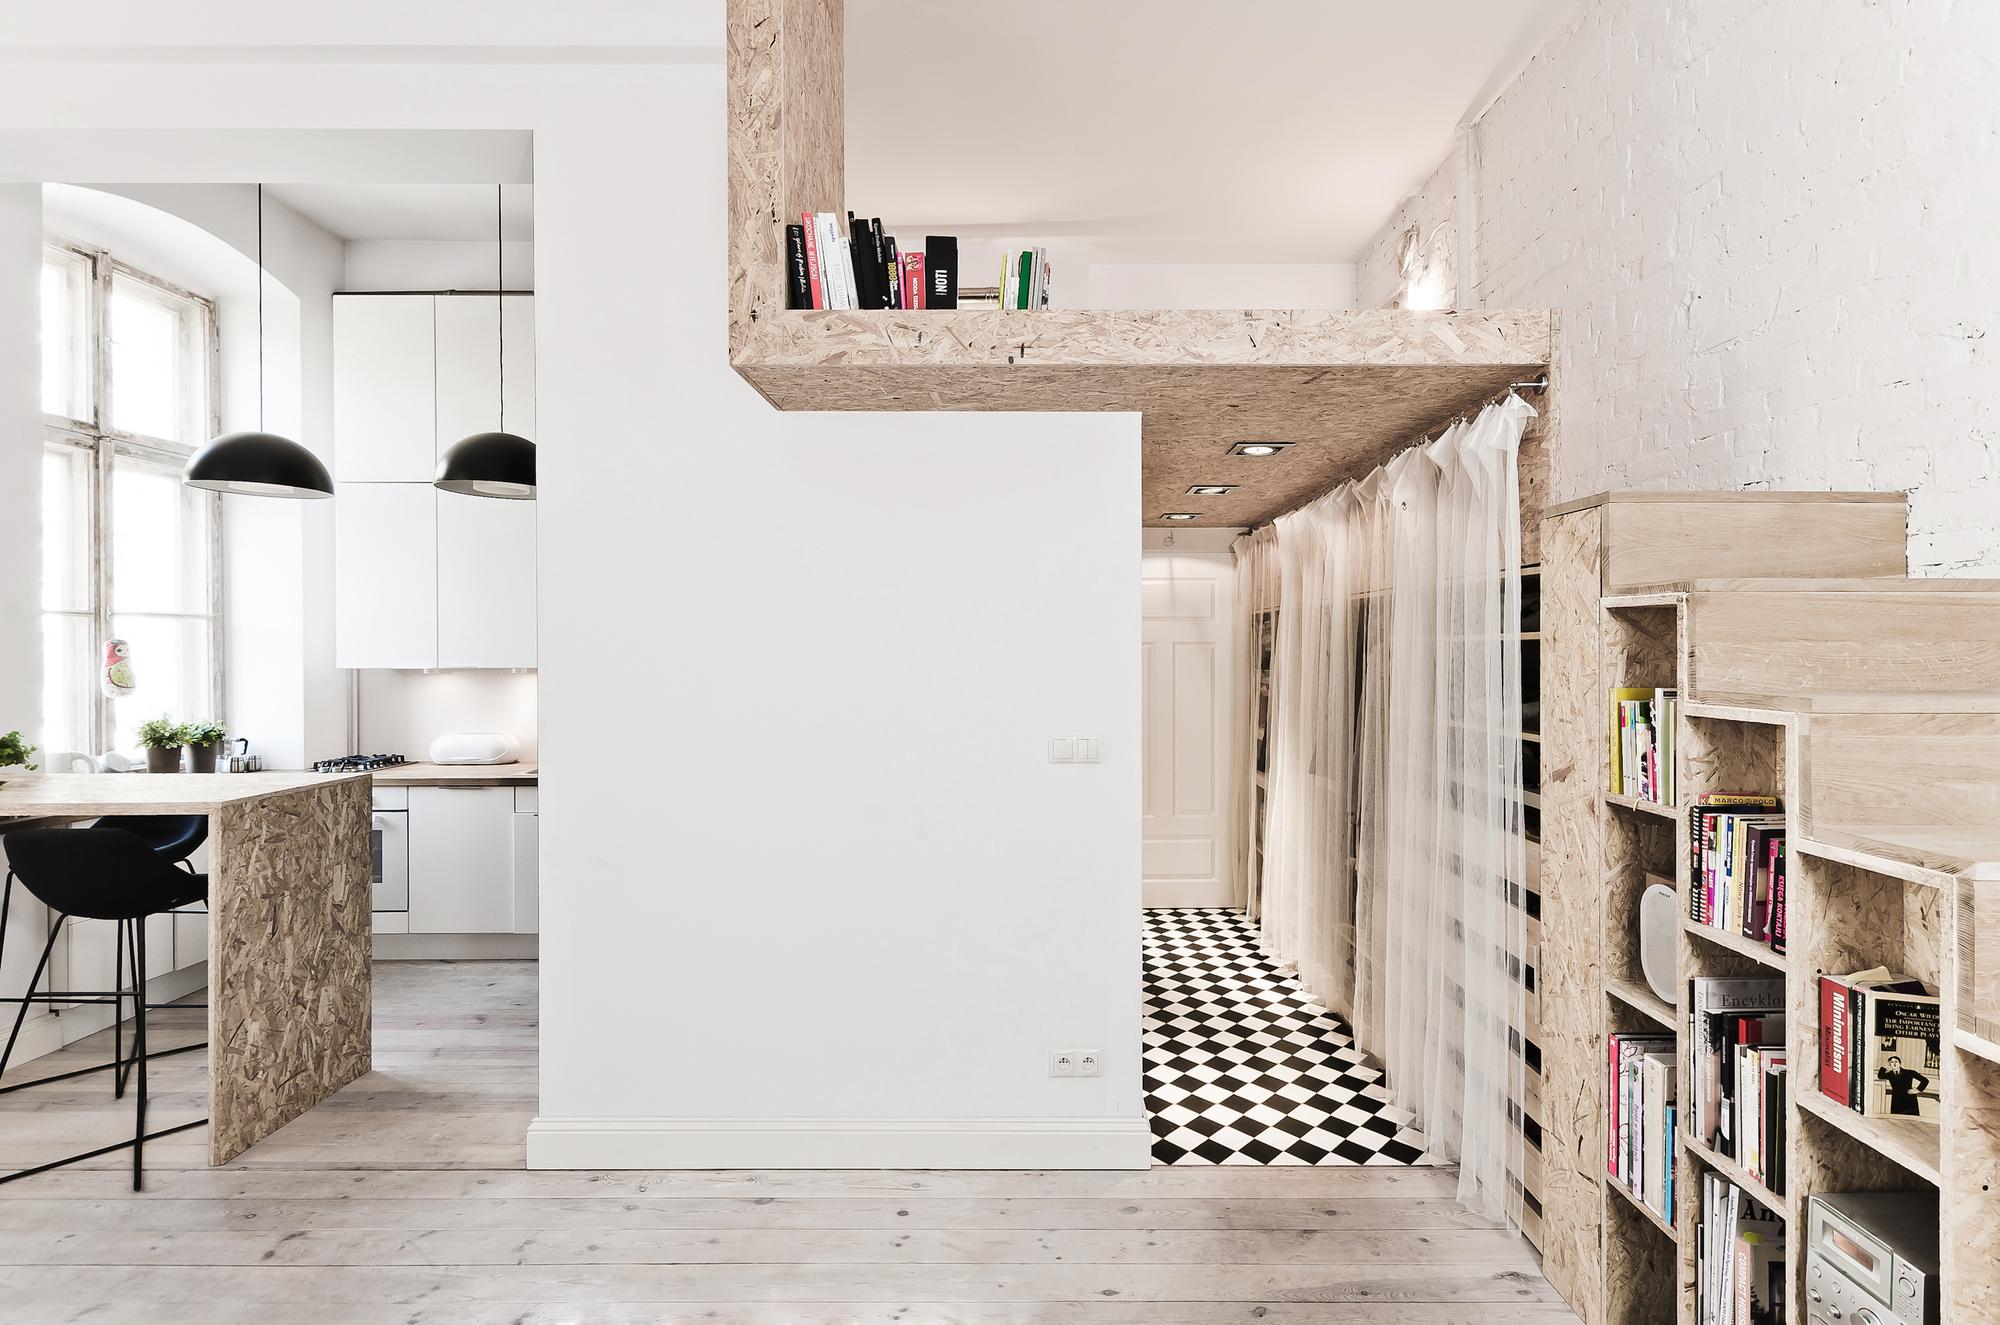 Apartament amenajat in doar 29mp - Apartament amenajat in doar 29 mp